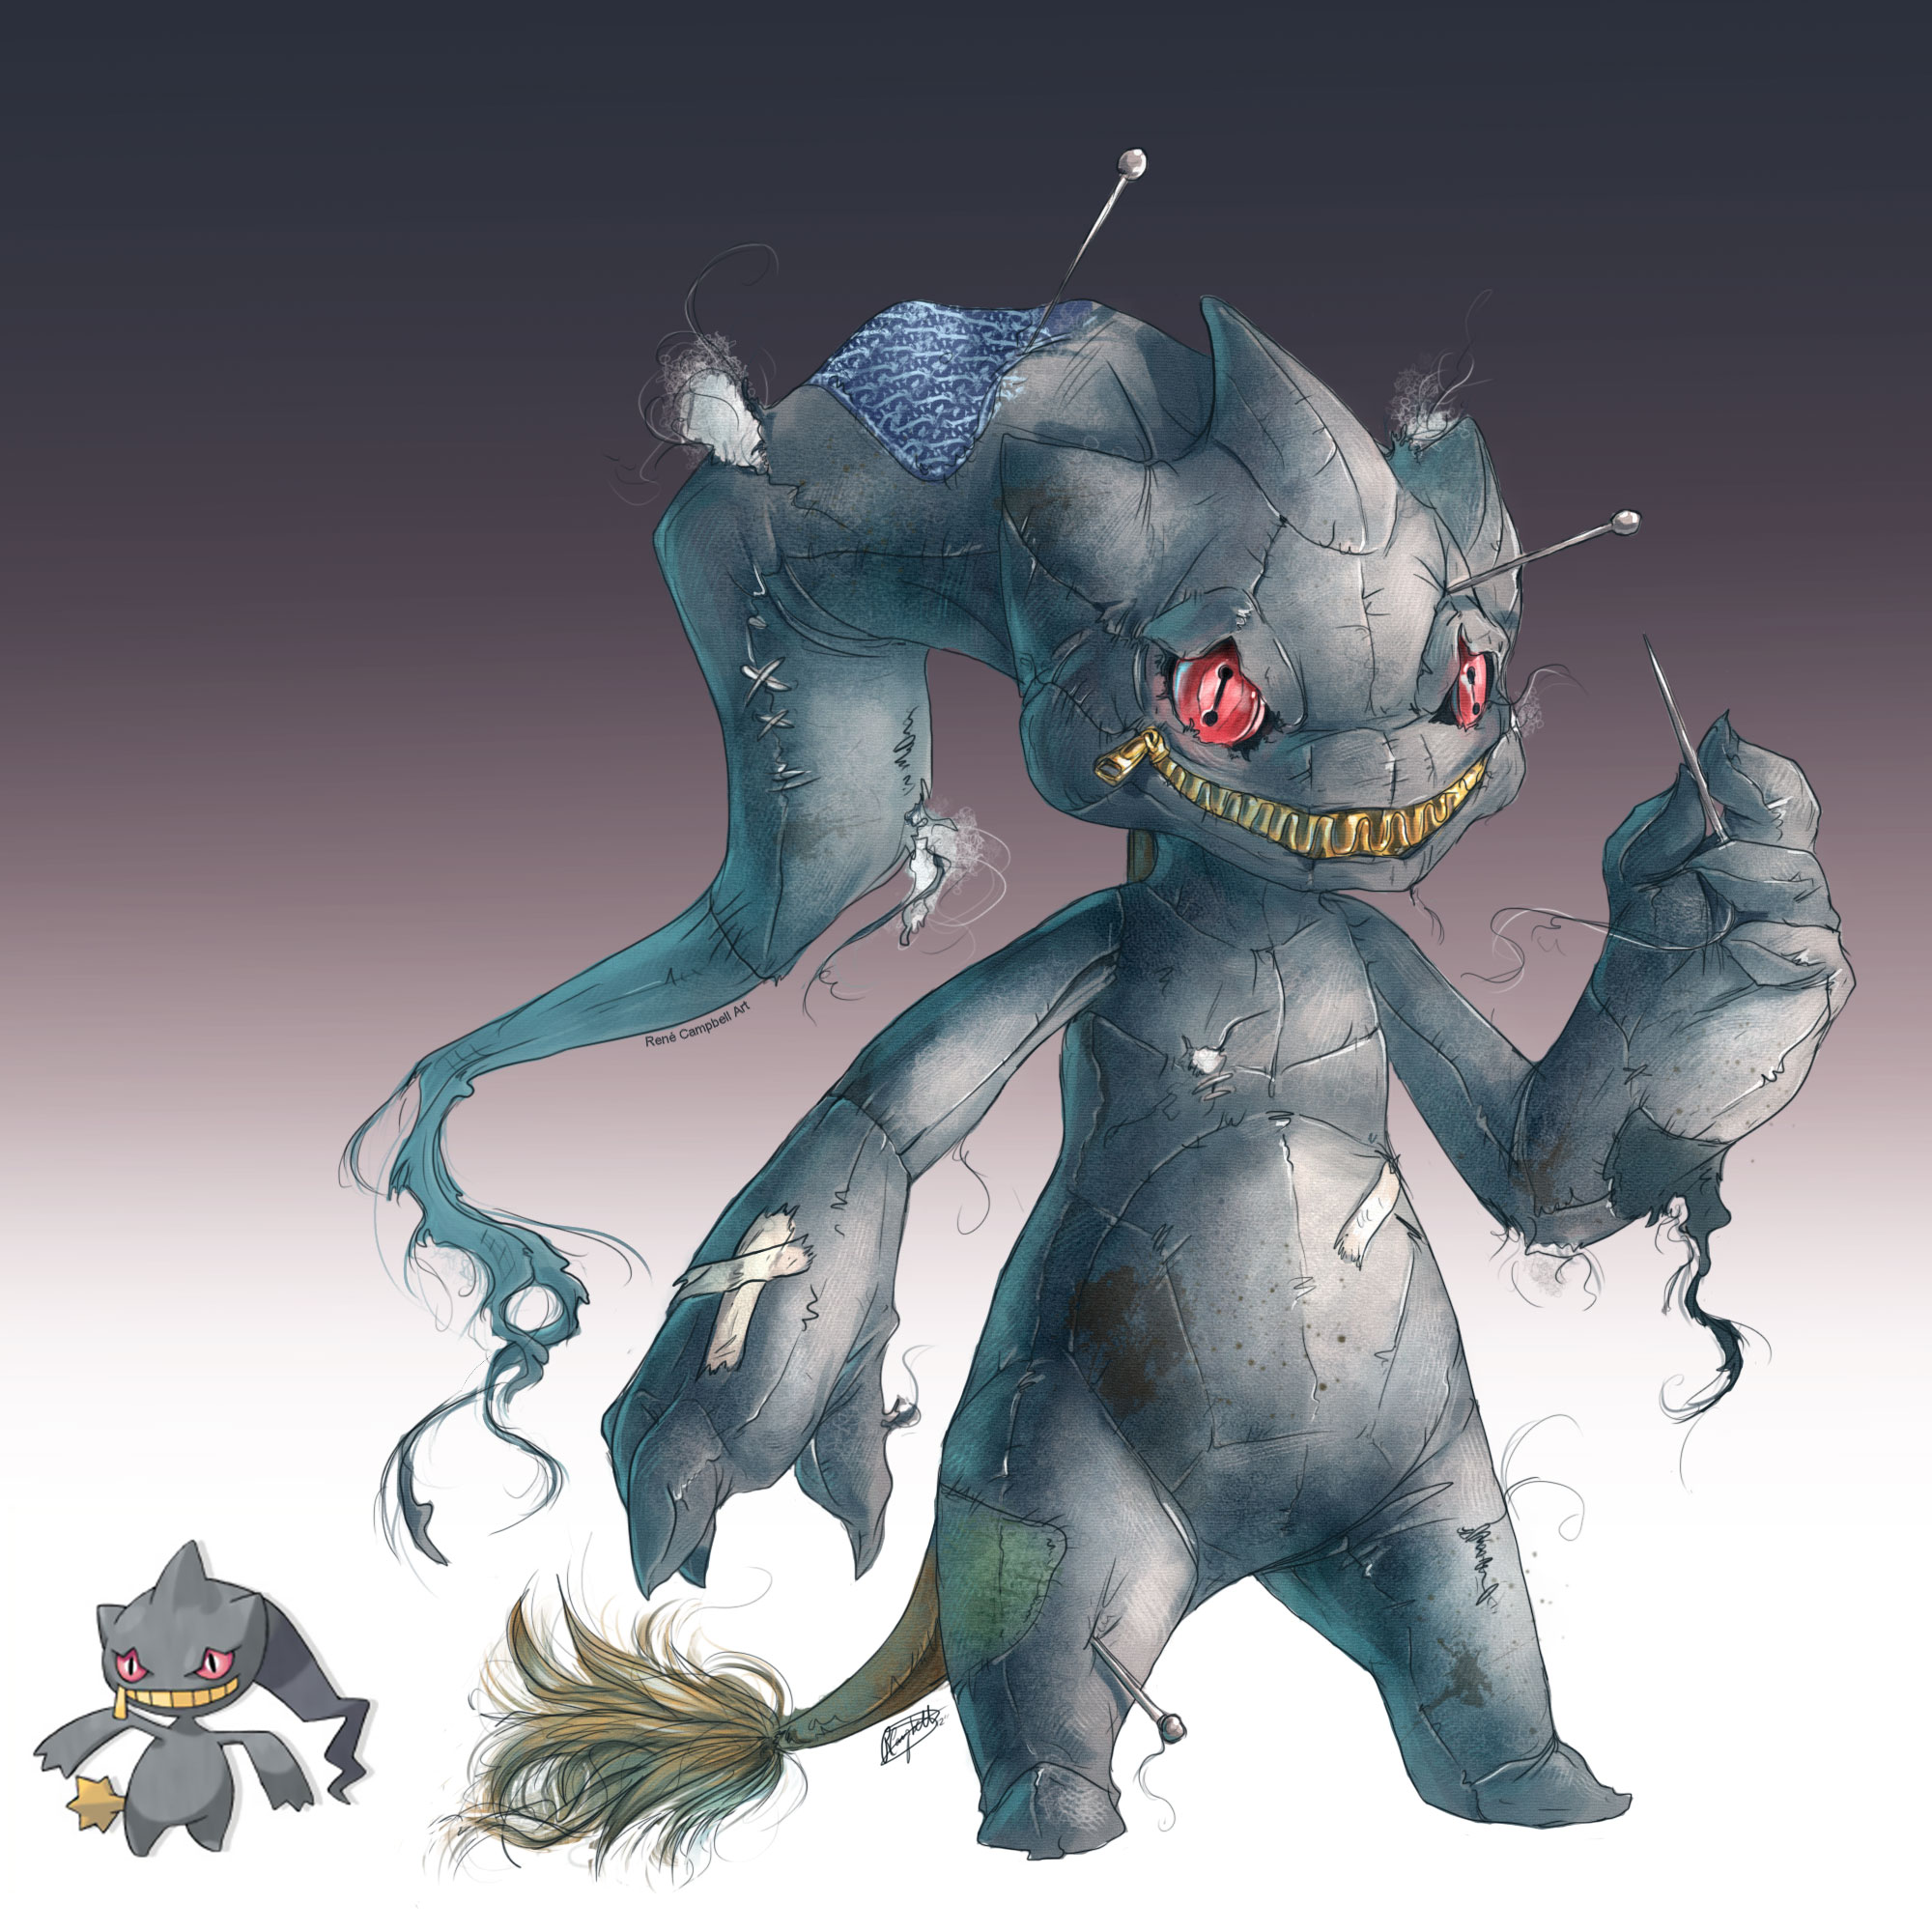 Realistic Pokemon: Banette by ReneCampbellArt